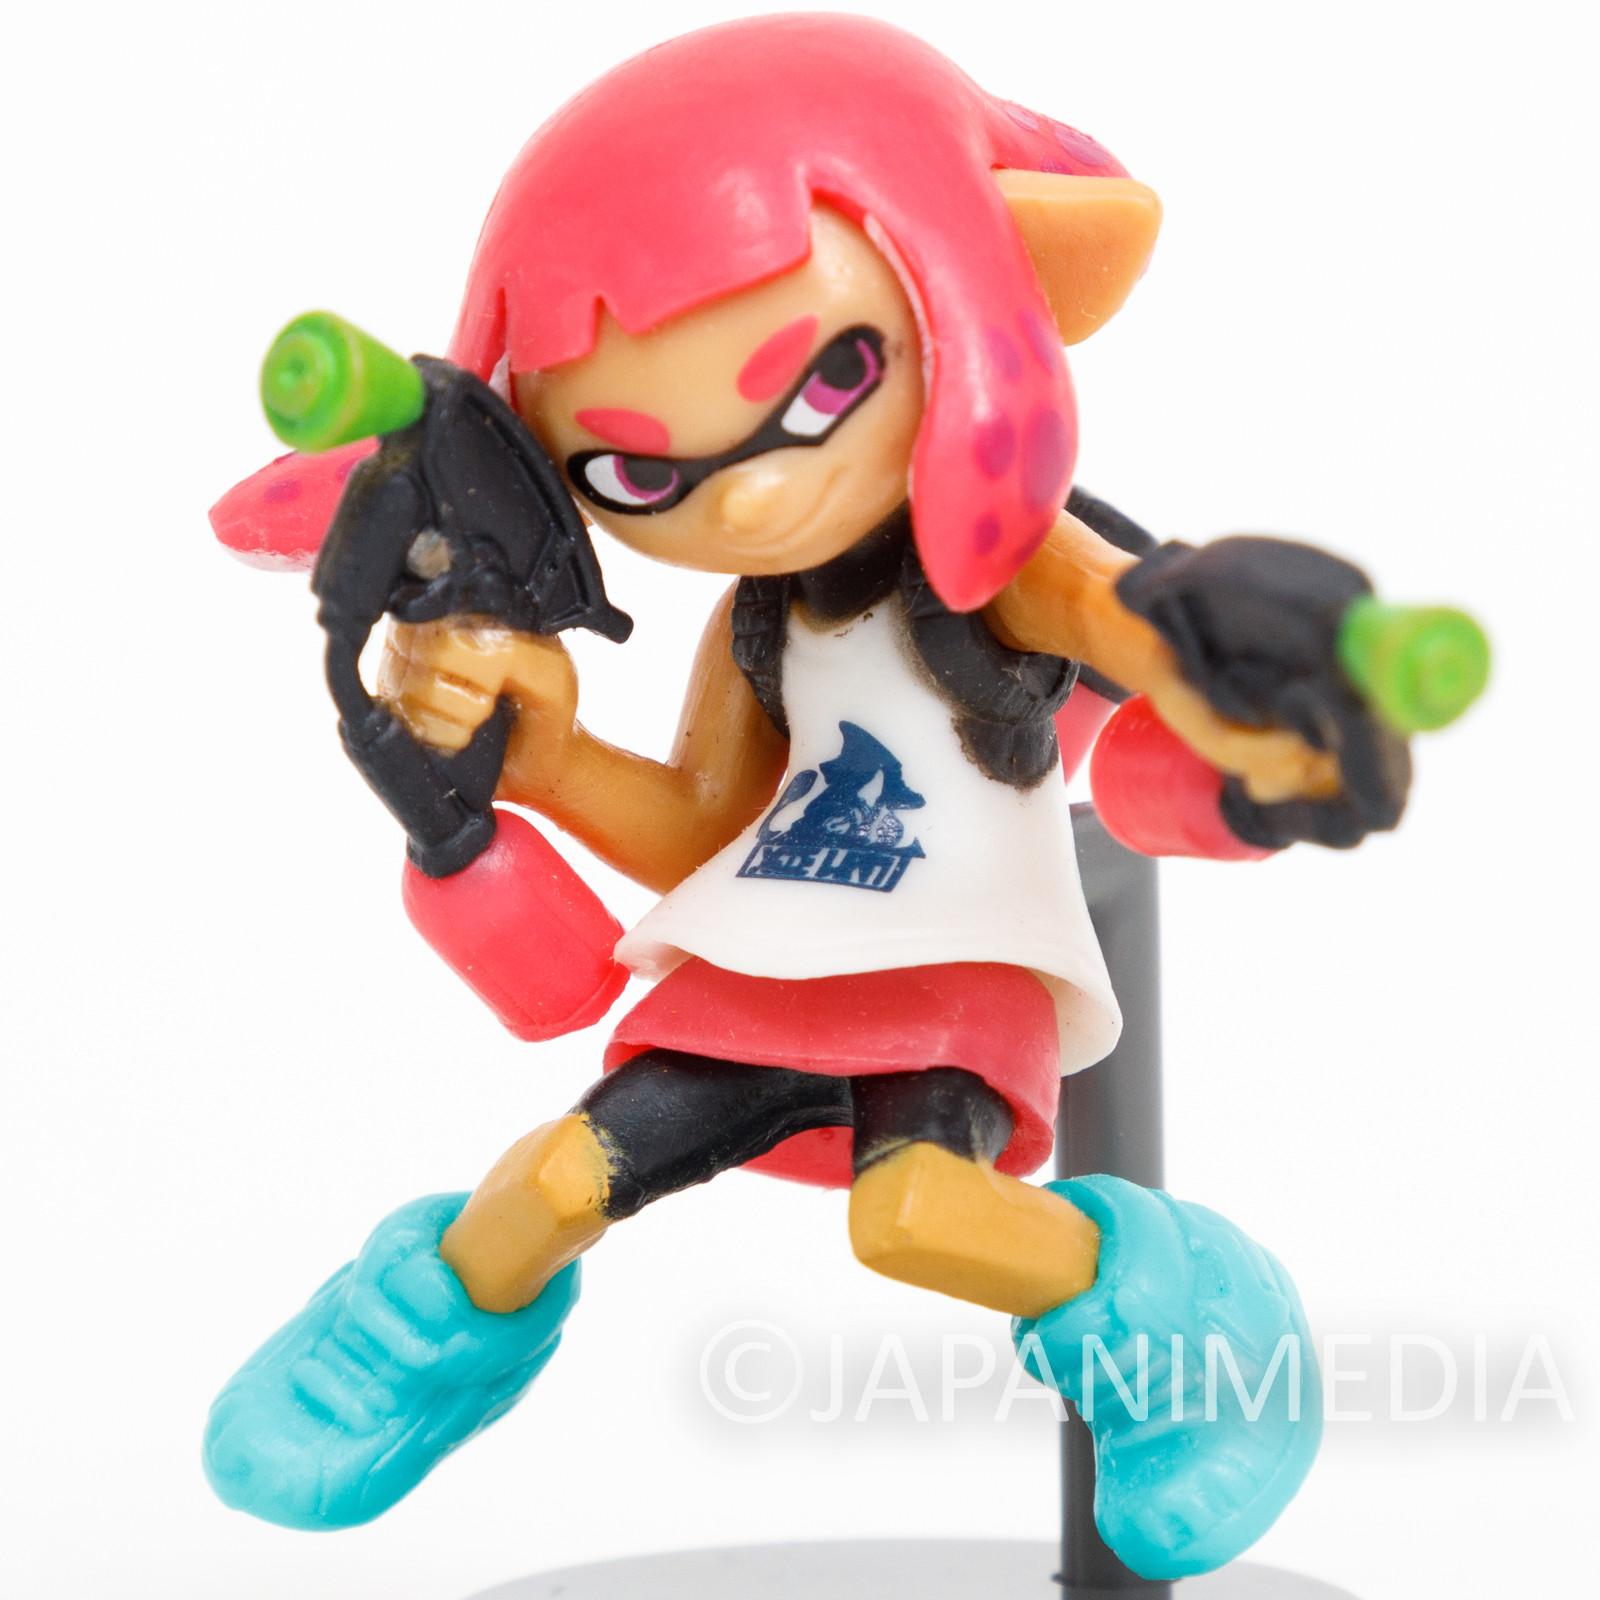 Splatoon 2 Squid GIRL with Splat Dualies Choco-egg Mini Figure JAPAN SWITCH